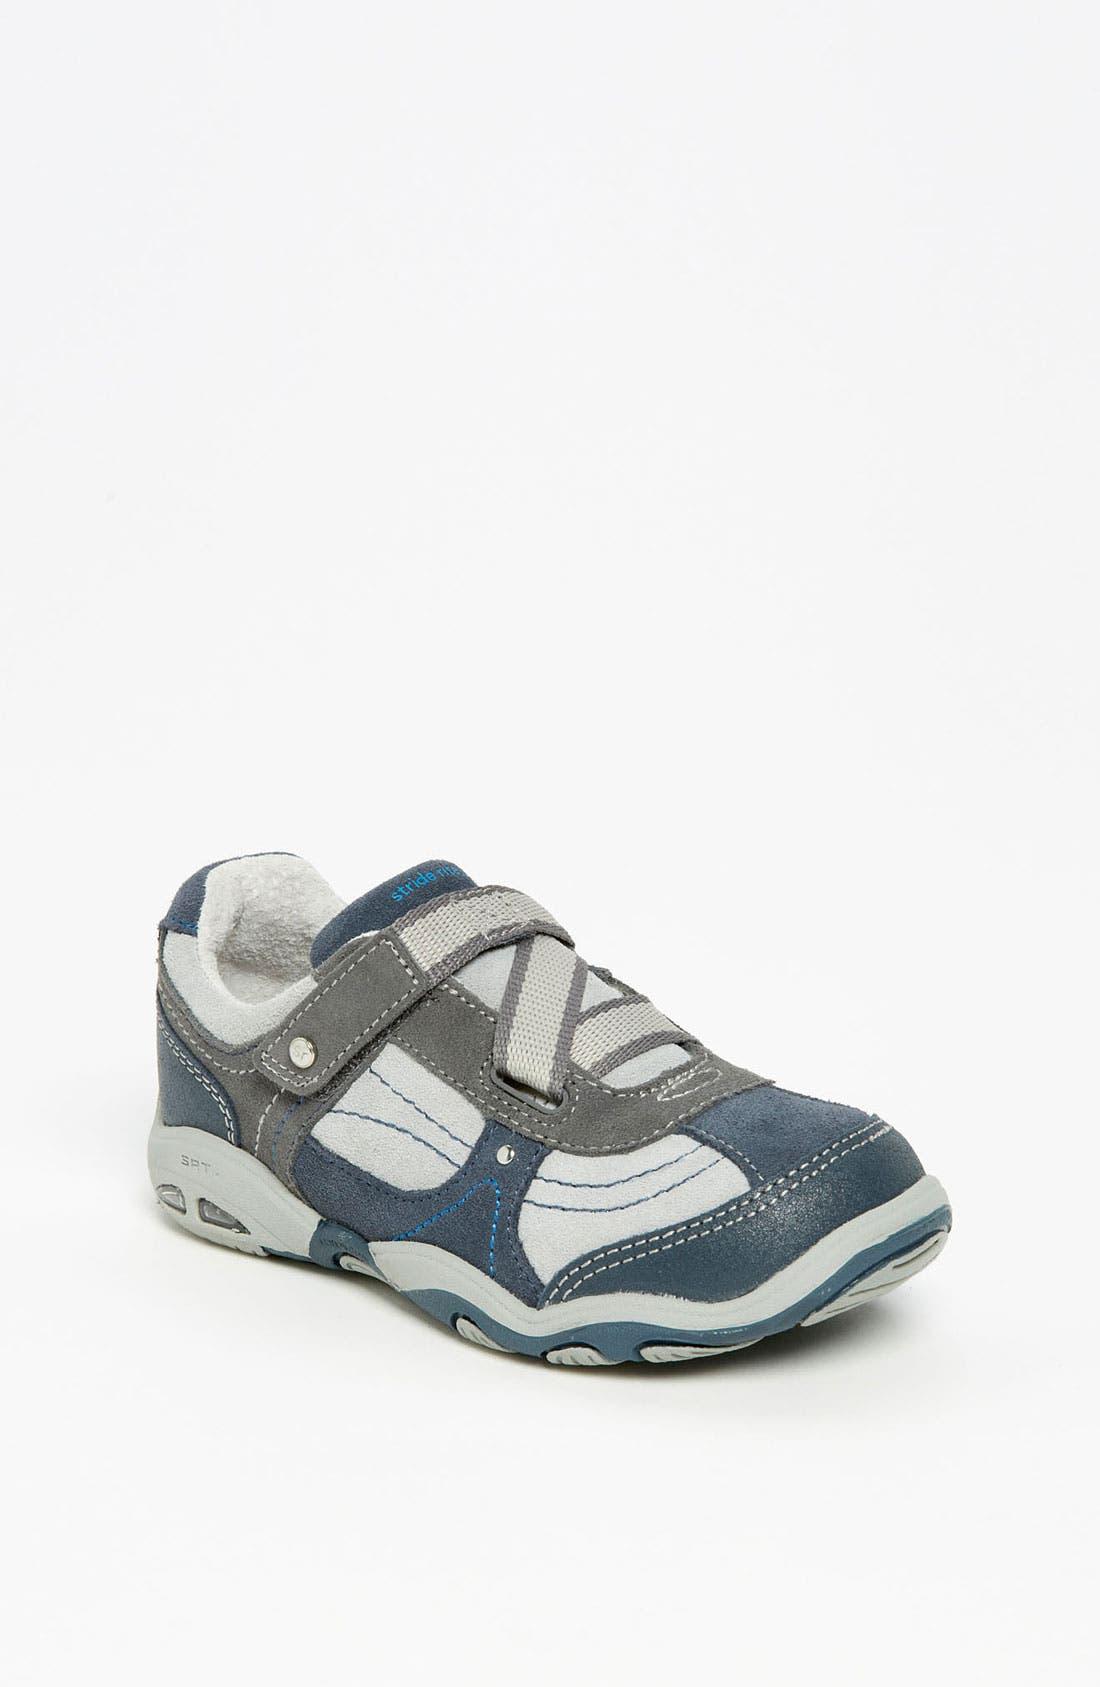 Alternate Image 1 Selected - Stride Rite 'Chad' Sneaker (Toddler & Little Kid)